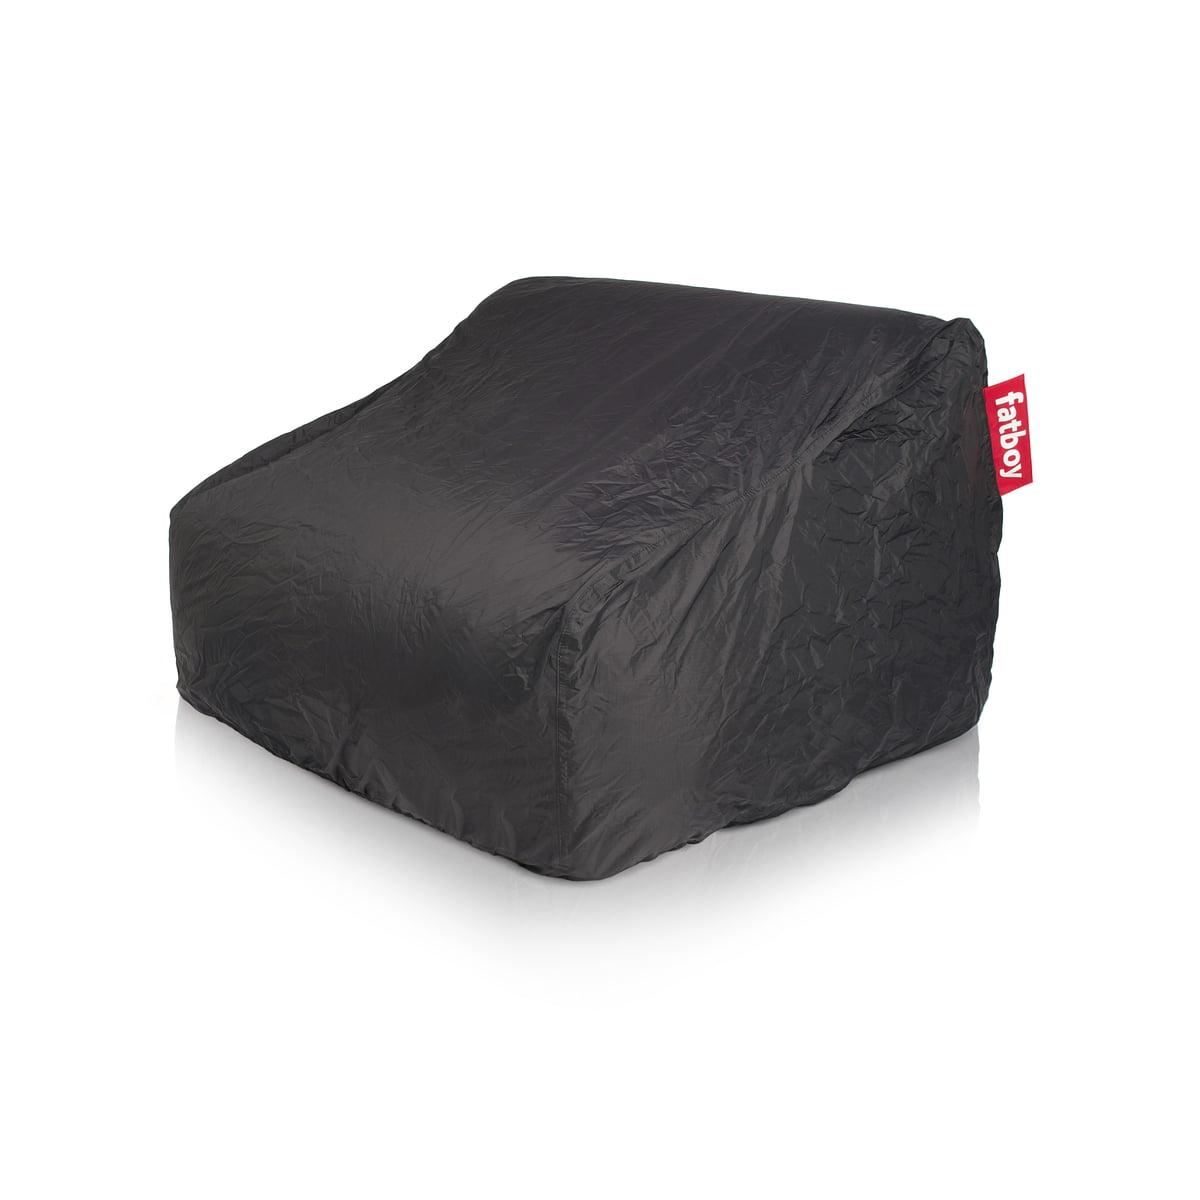 Tsjonge Sitzsack Von Fatboy Connox